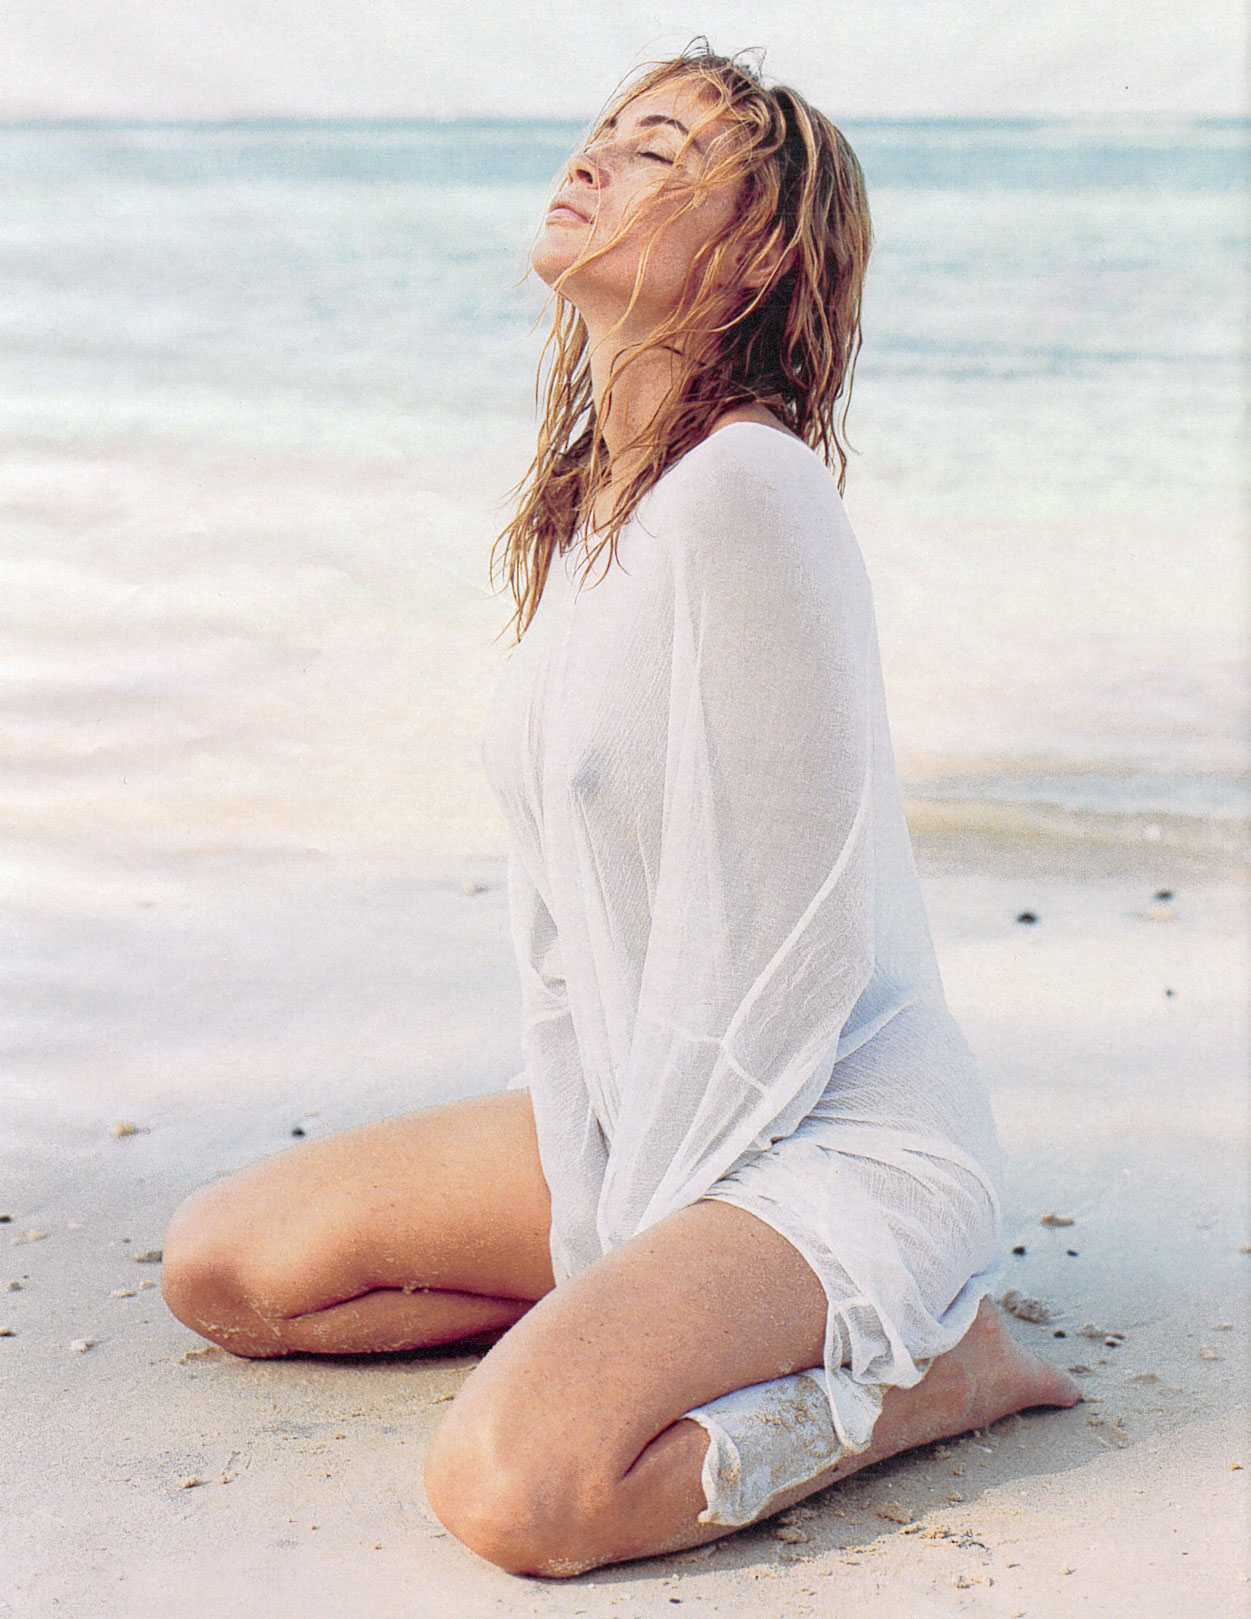 А если голая Эммануэль Беар (Emmanuelle Beart) не достаточно тебя